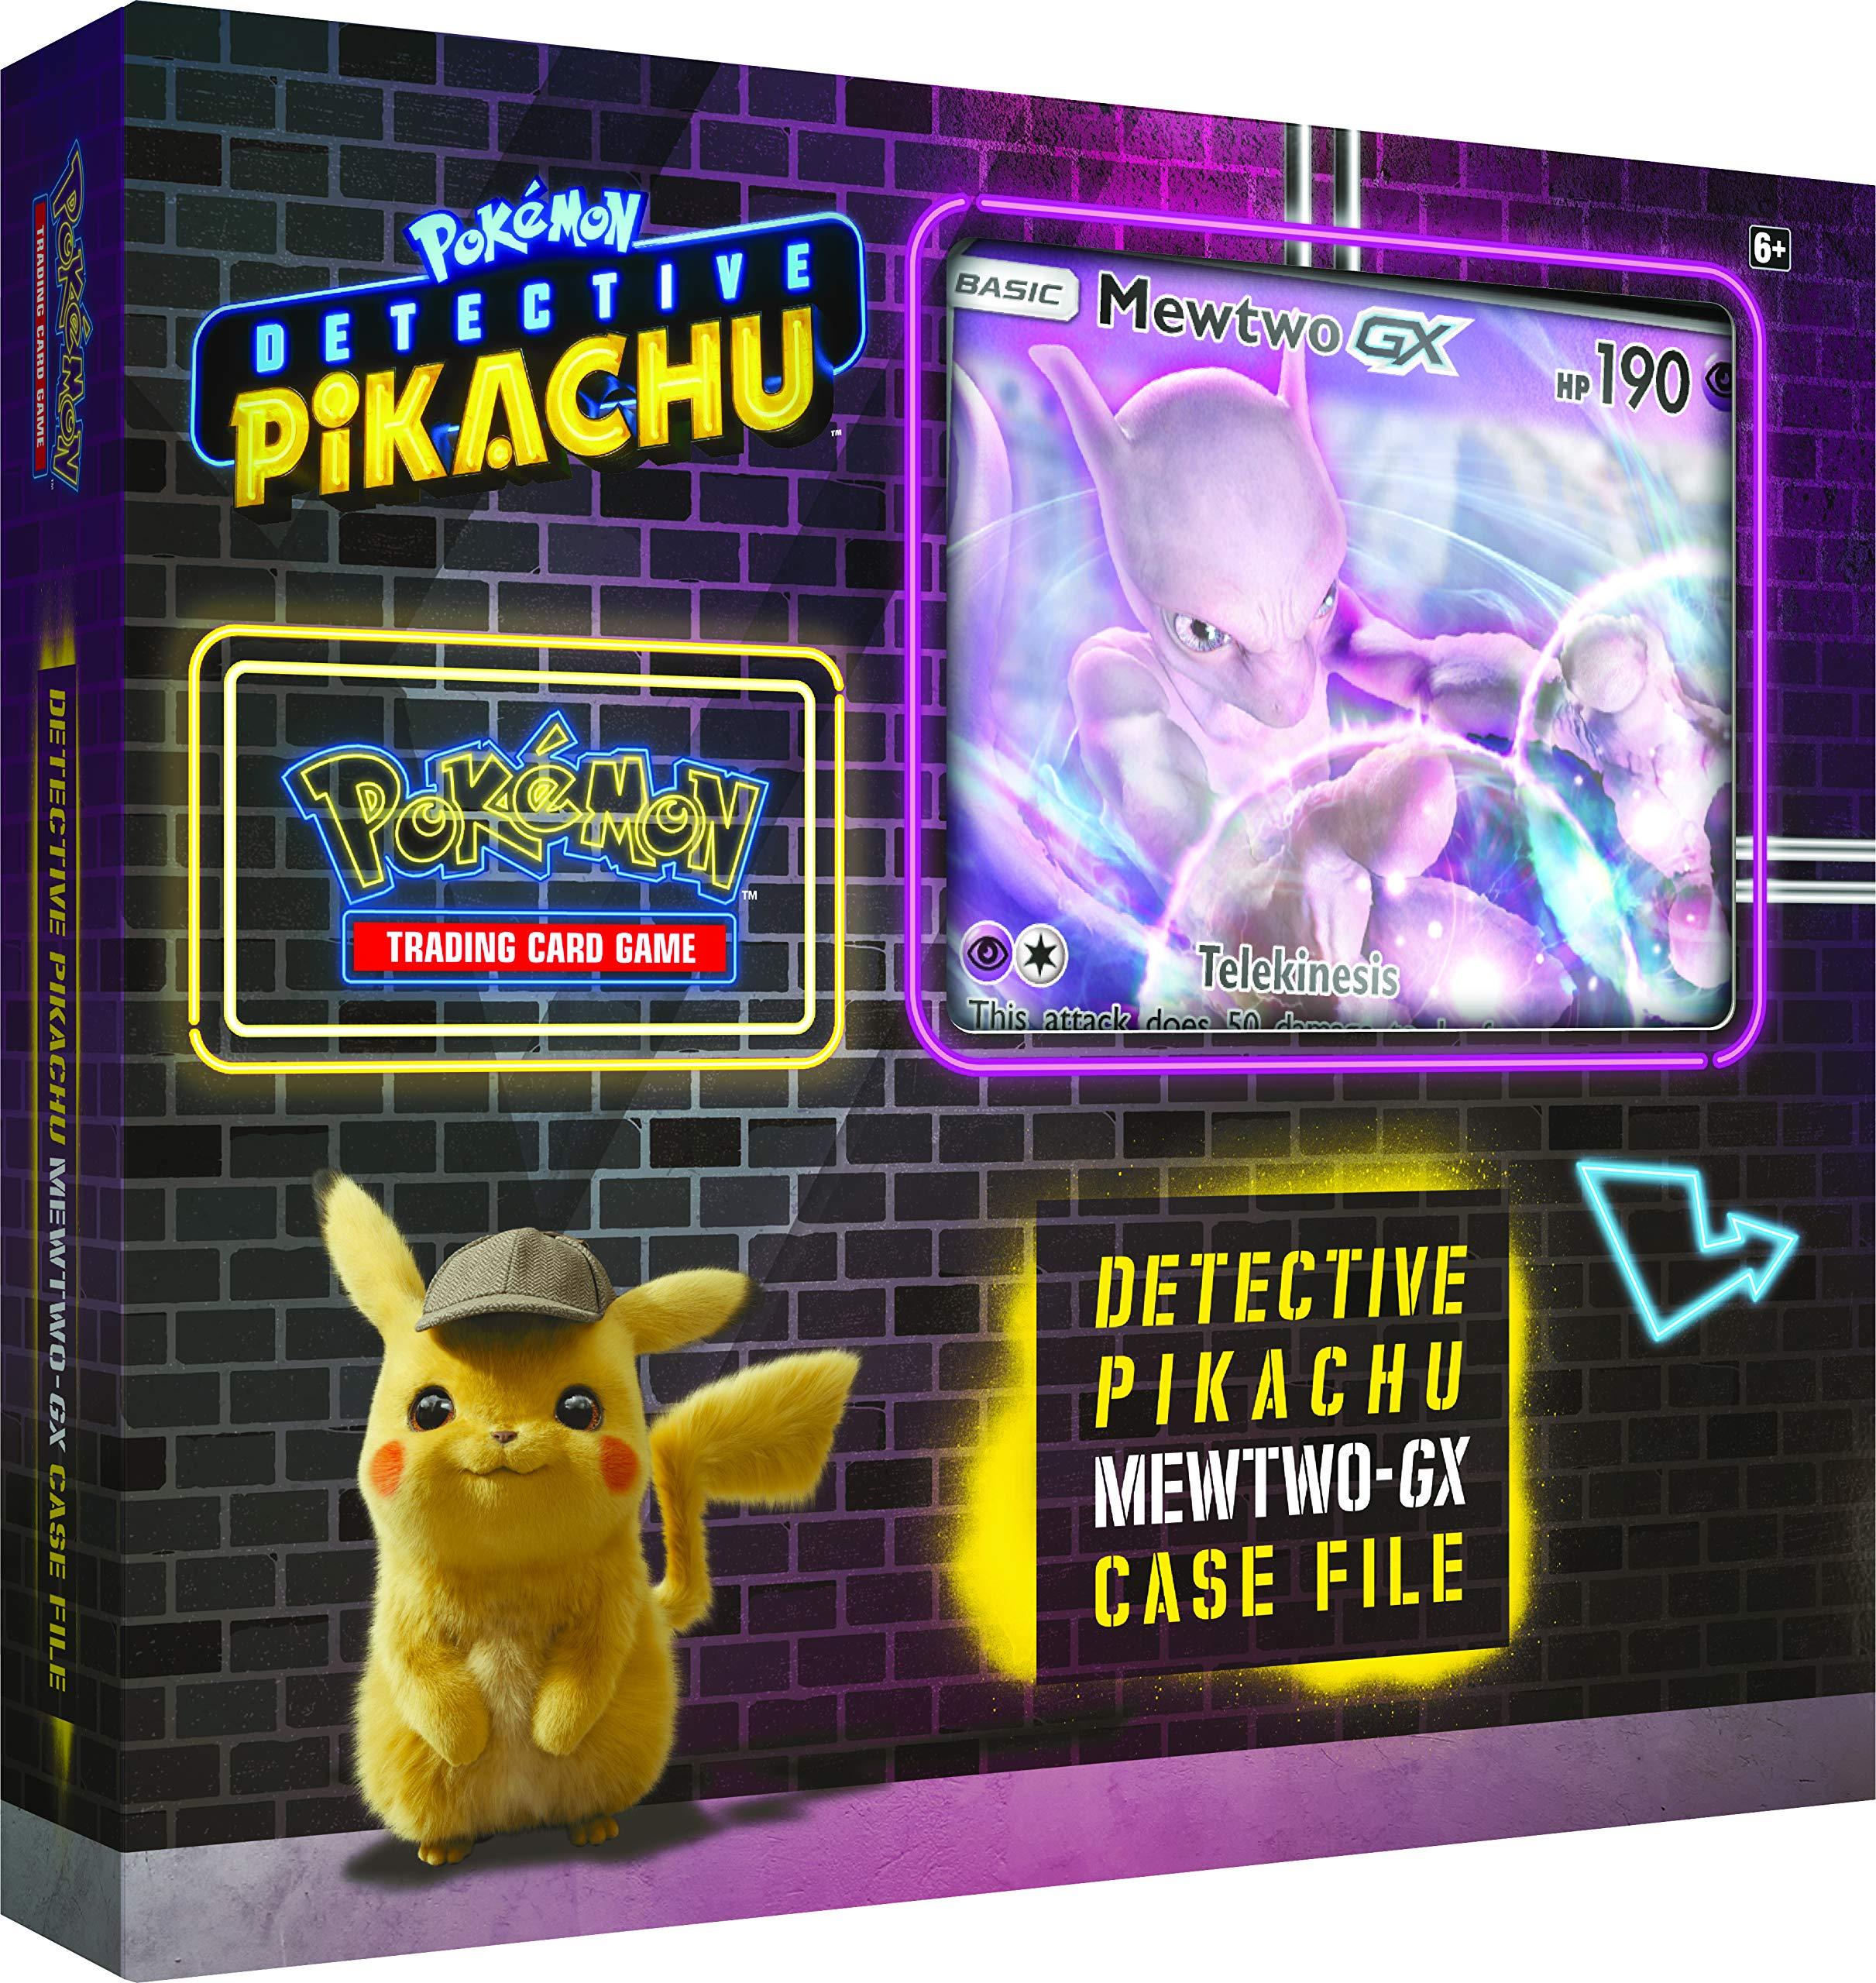 Pokemon TCG: Detective Pikachu Mewtwo-Gx Case File + 6 Booster Pack + A Foil Promo Gx Card + A Oversize Gx Foil Card by Pokemon